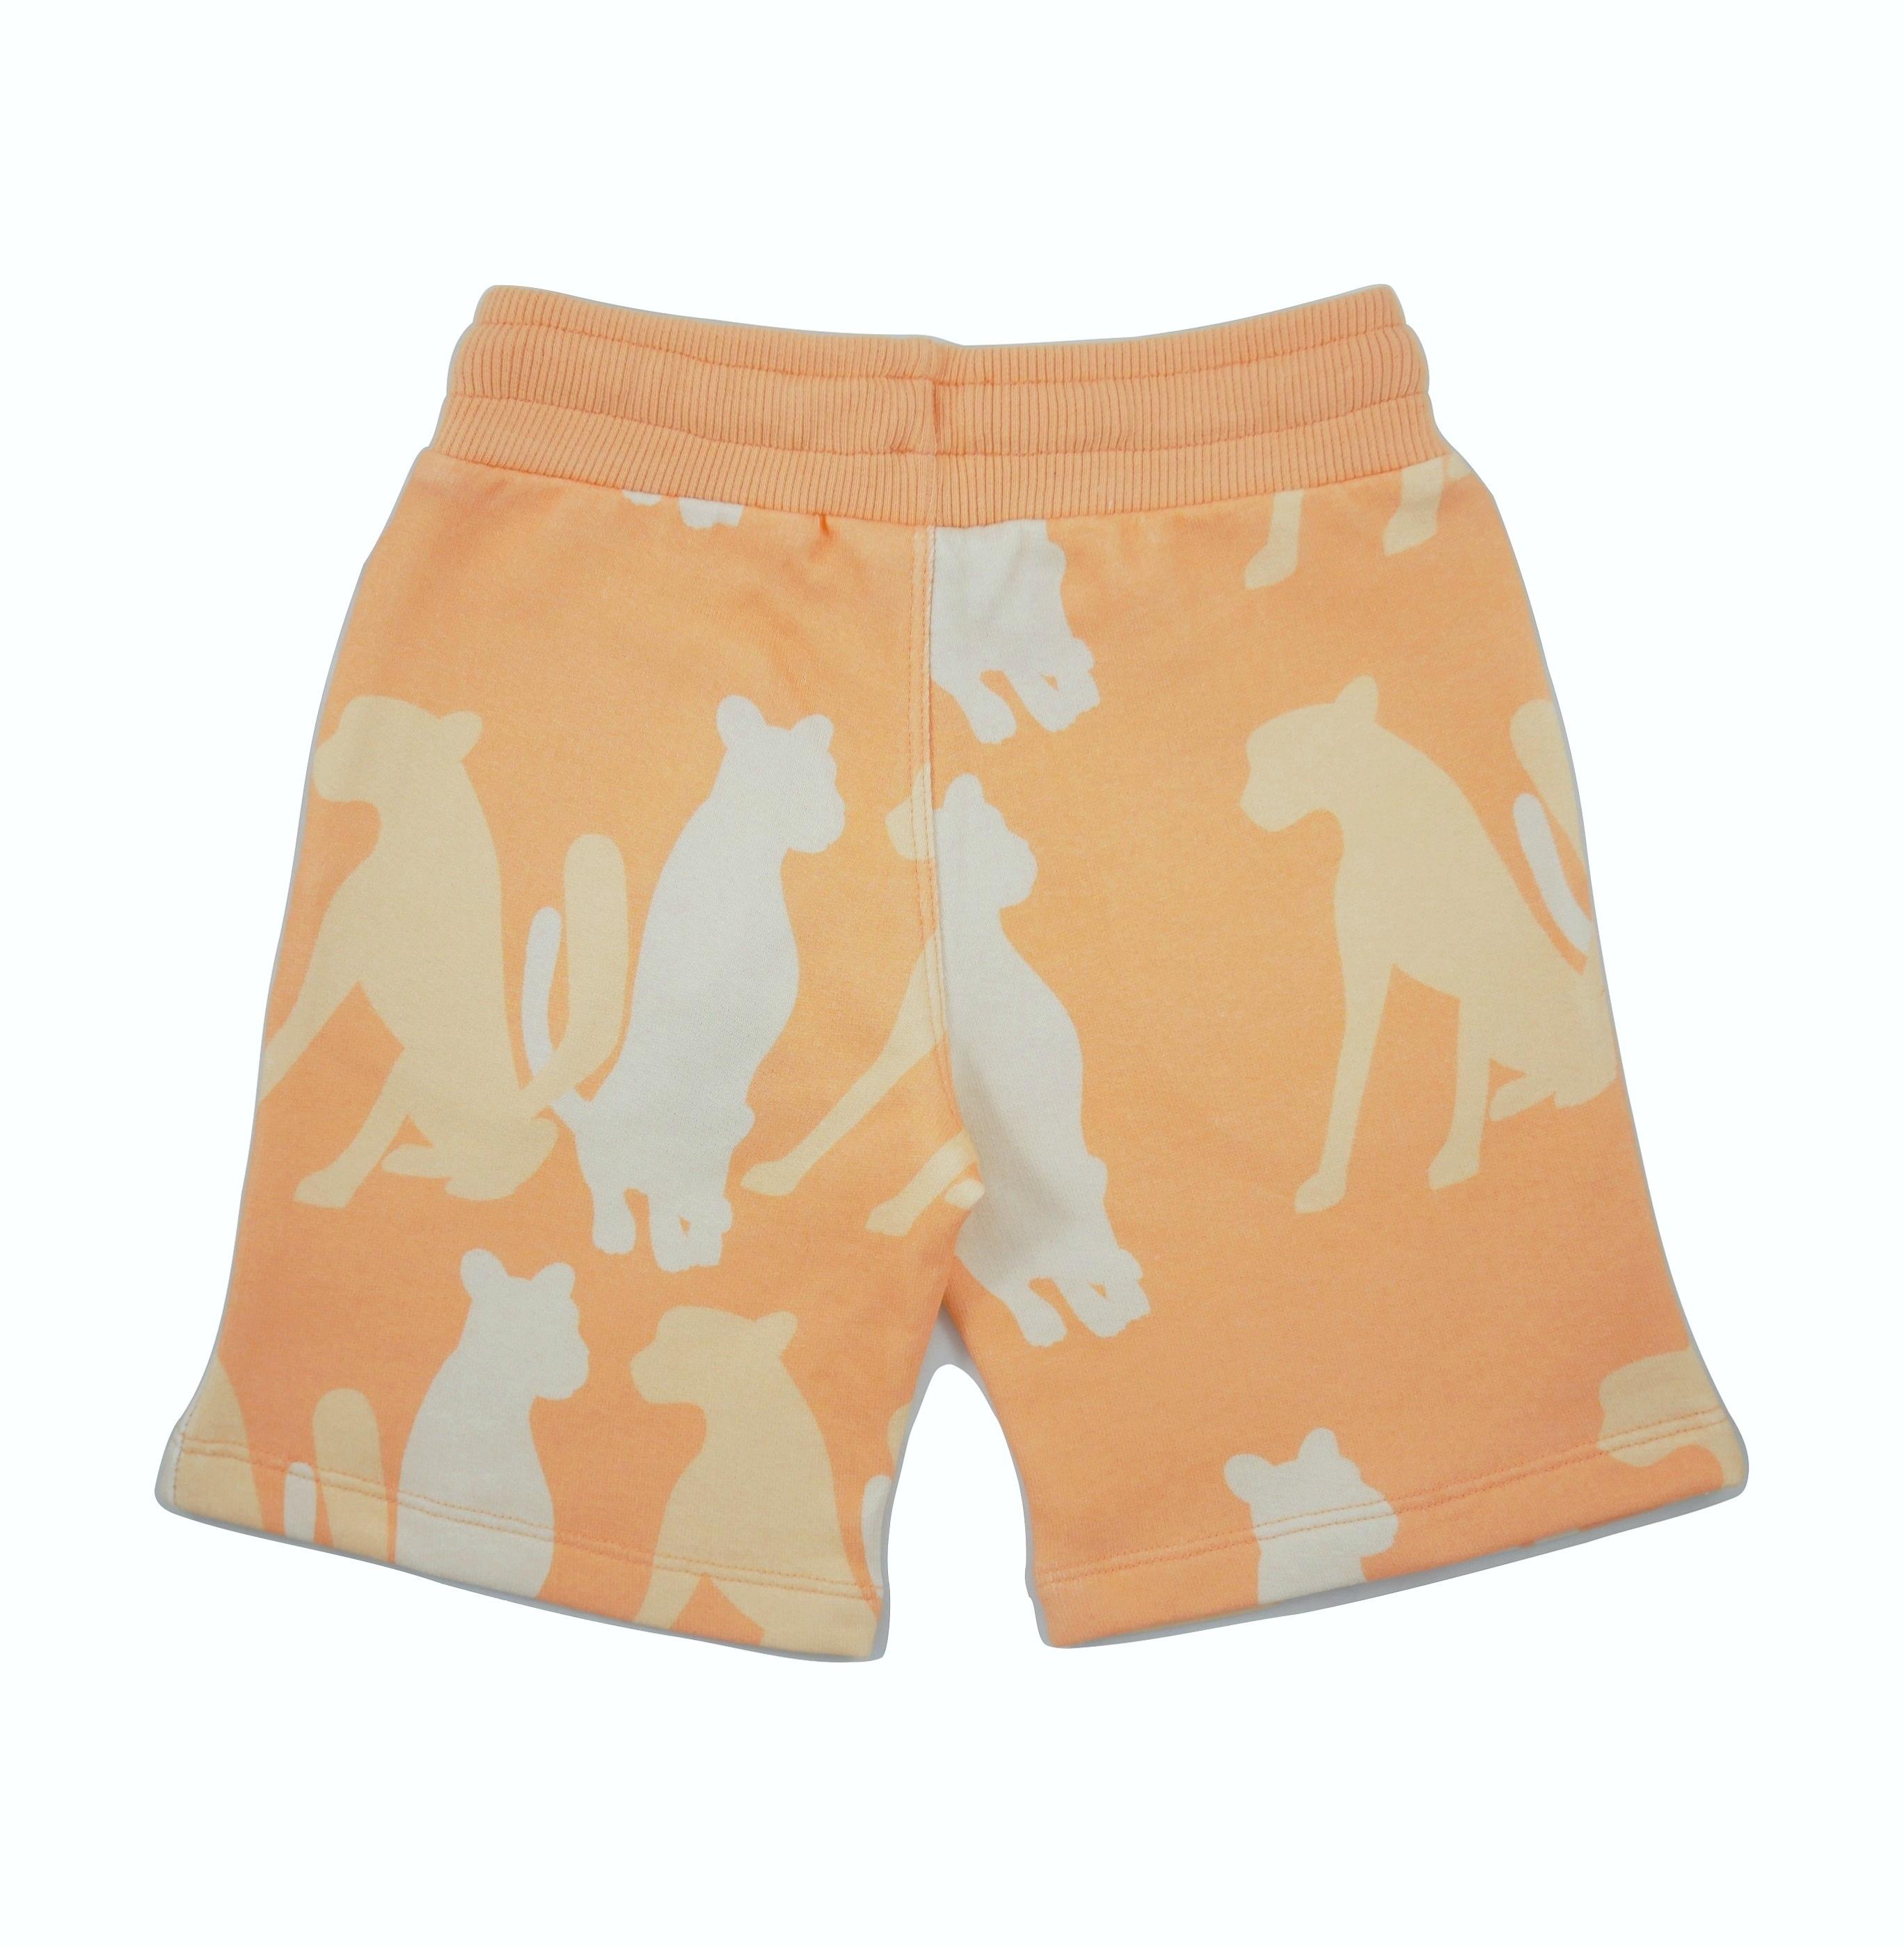 19SSSHC Shorts Cheetah Silouette back